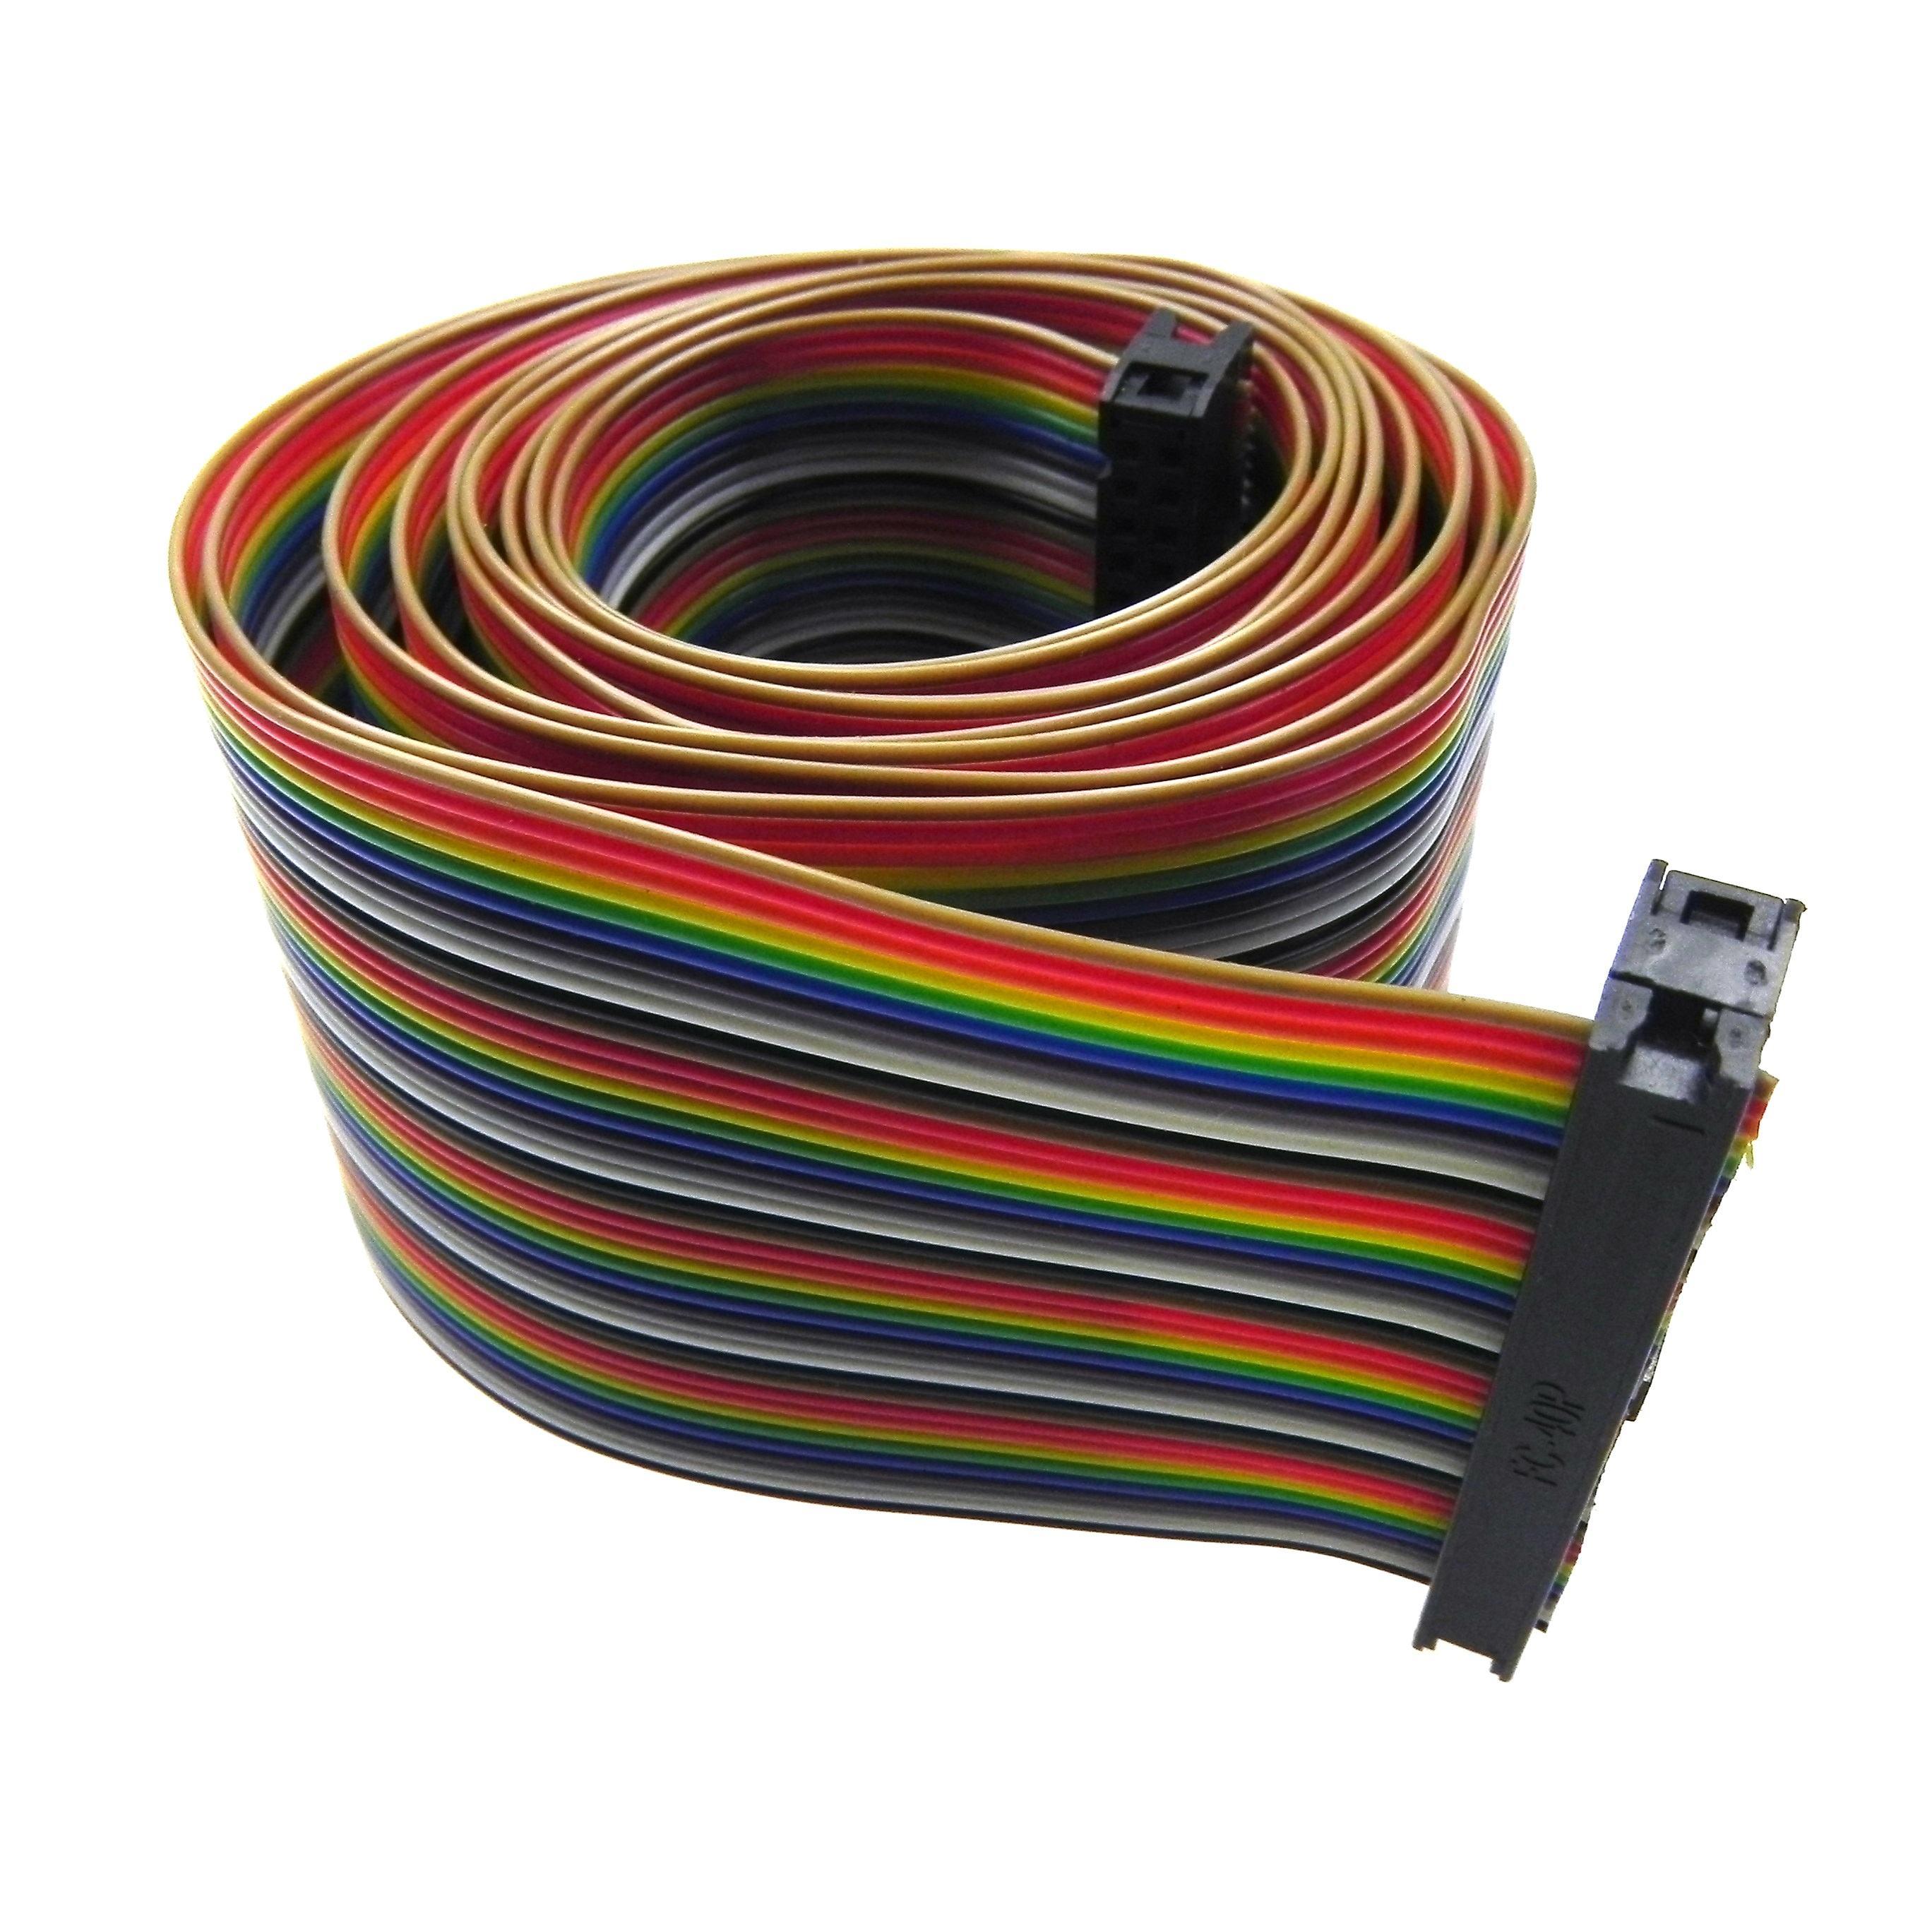 M-M F-F jumper protoboard Alambre GPIO cables planos Acce 40Pcs cables Dupont M-F